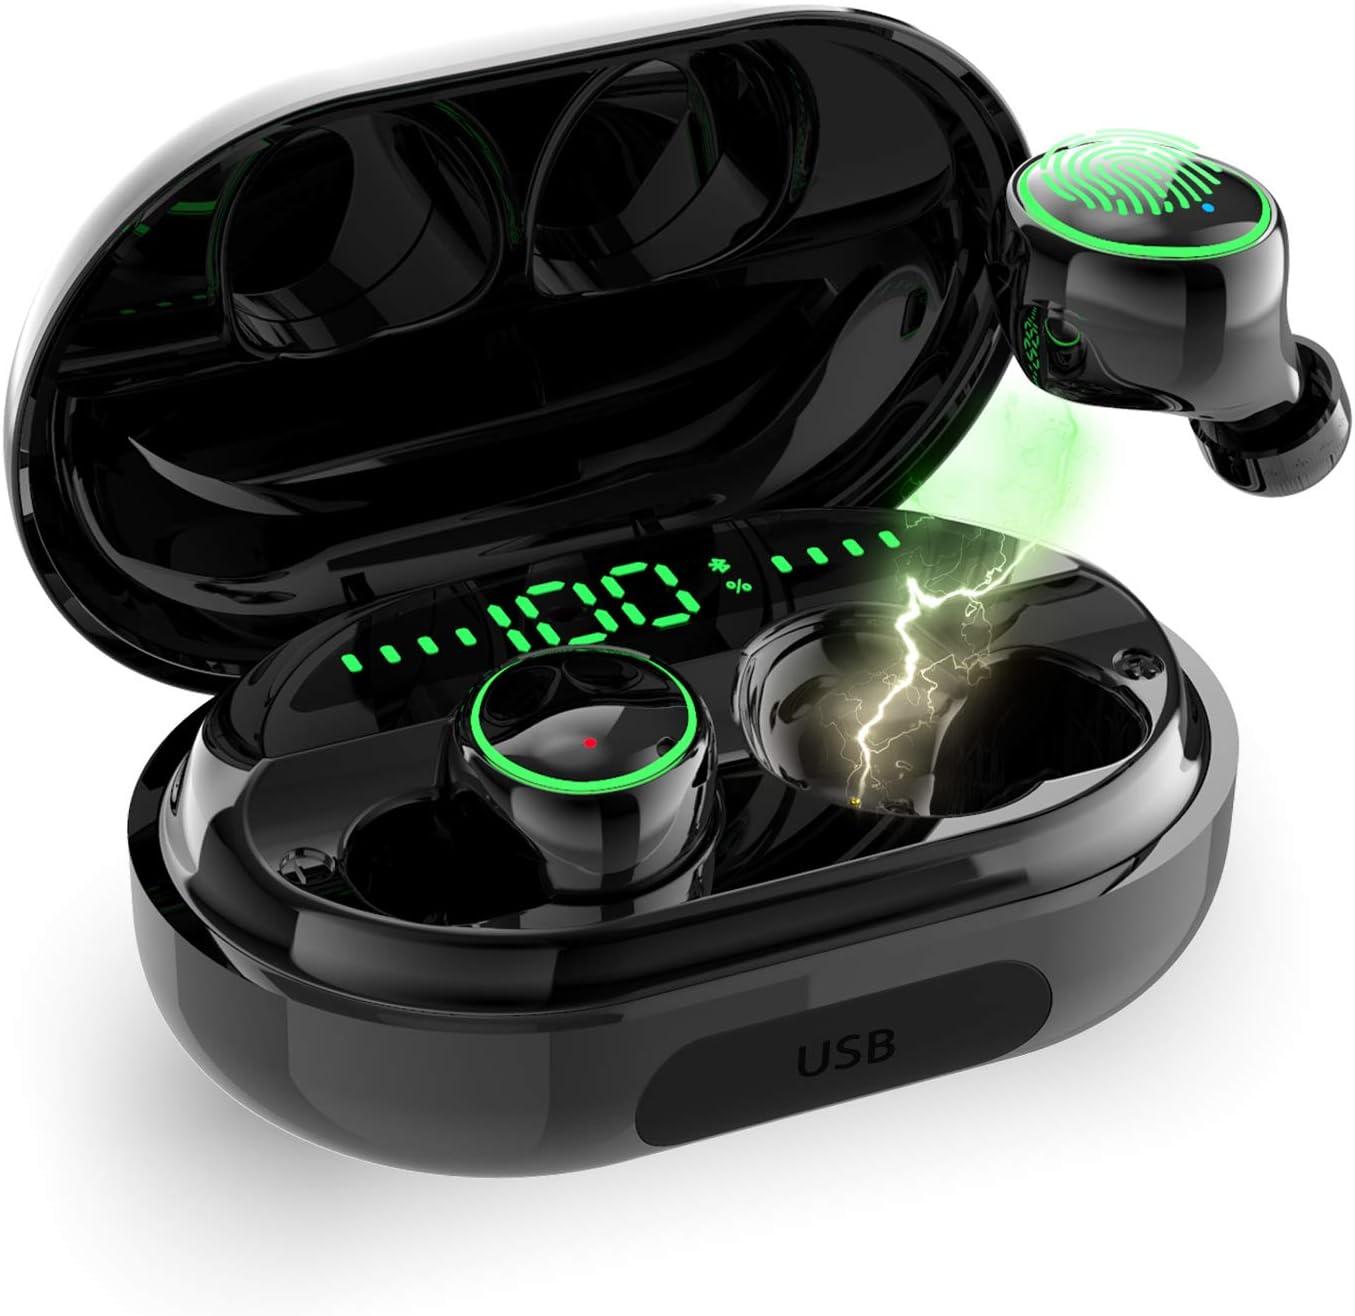 HCDjgh Bluetooth Earphones with Microphone Wireless, Mini Twins Wireless Sports in-Ear Stereo Noise Cancelling On-Ear Headphones Purple